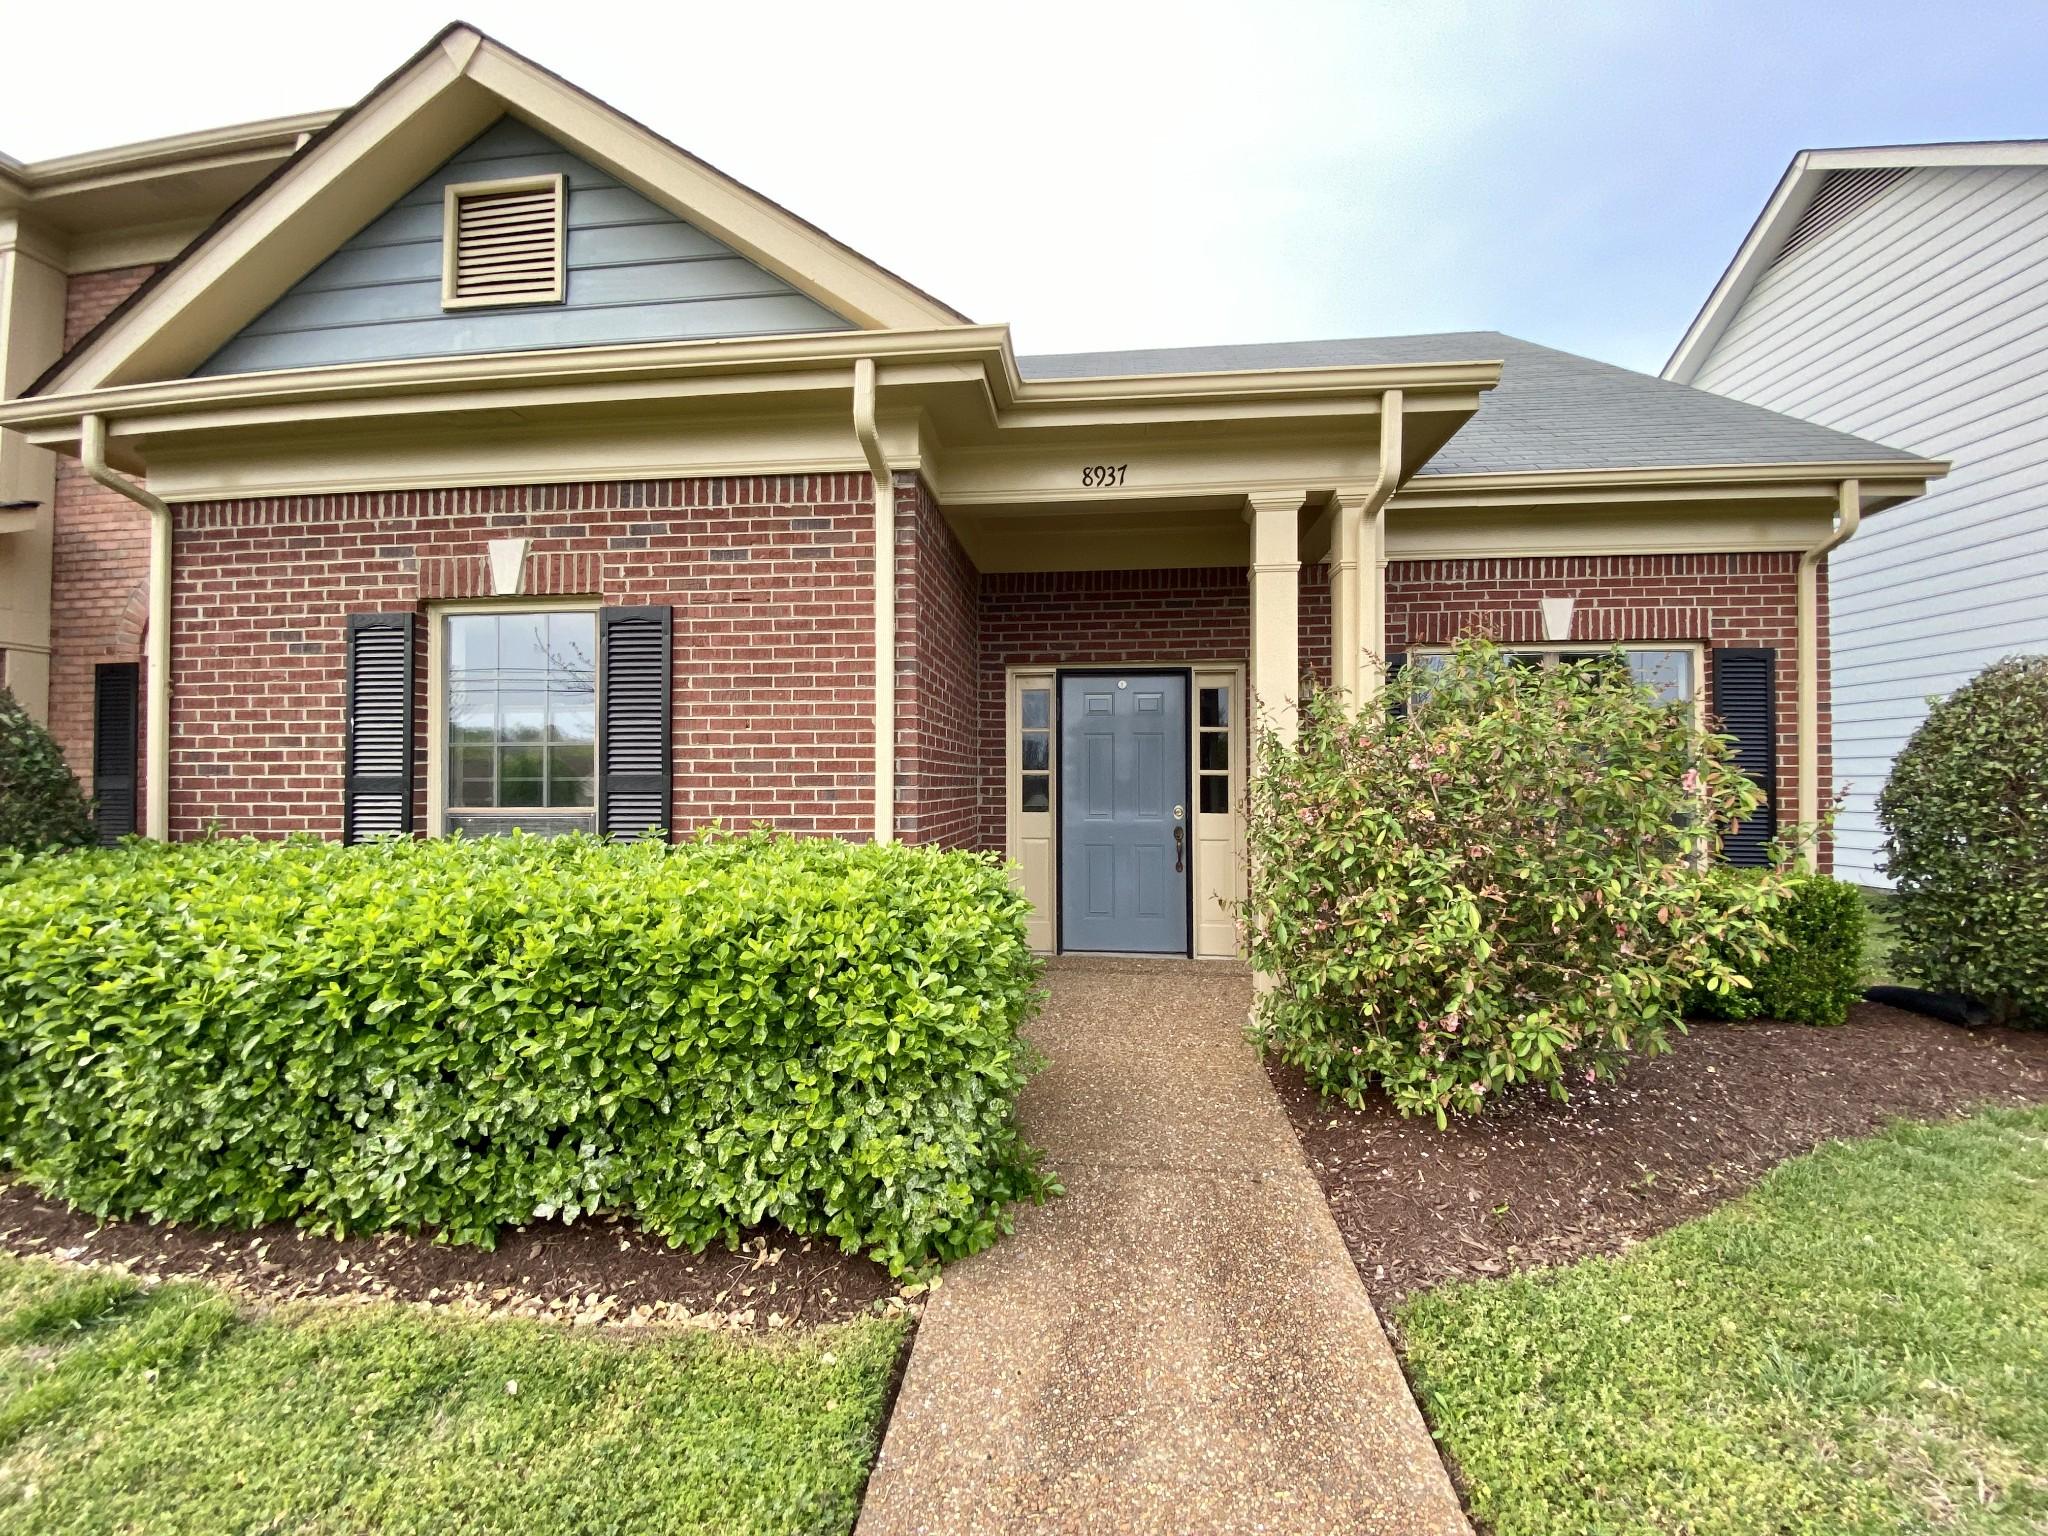 8937 Sawyer Brown Rd, Nashville, TN 37221 - Nashville, TN real estate listing